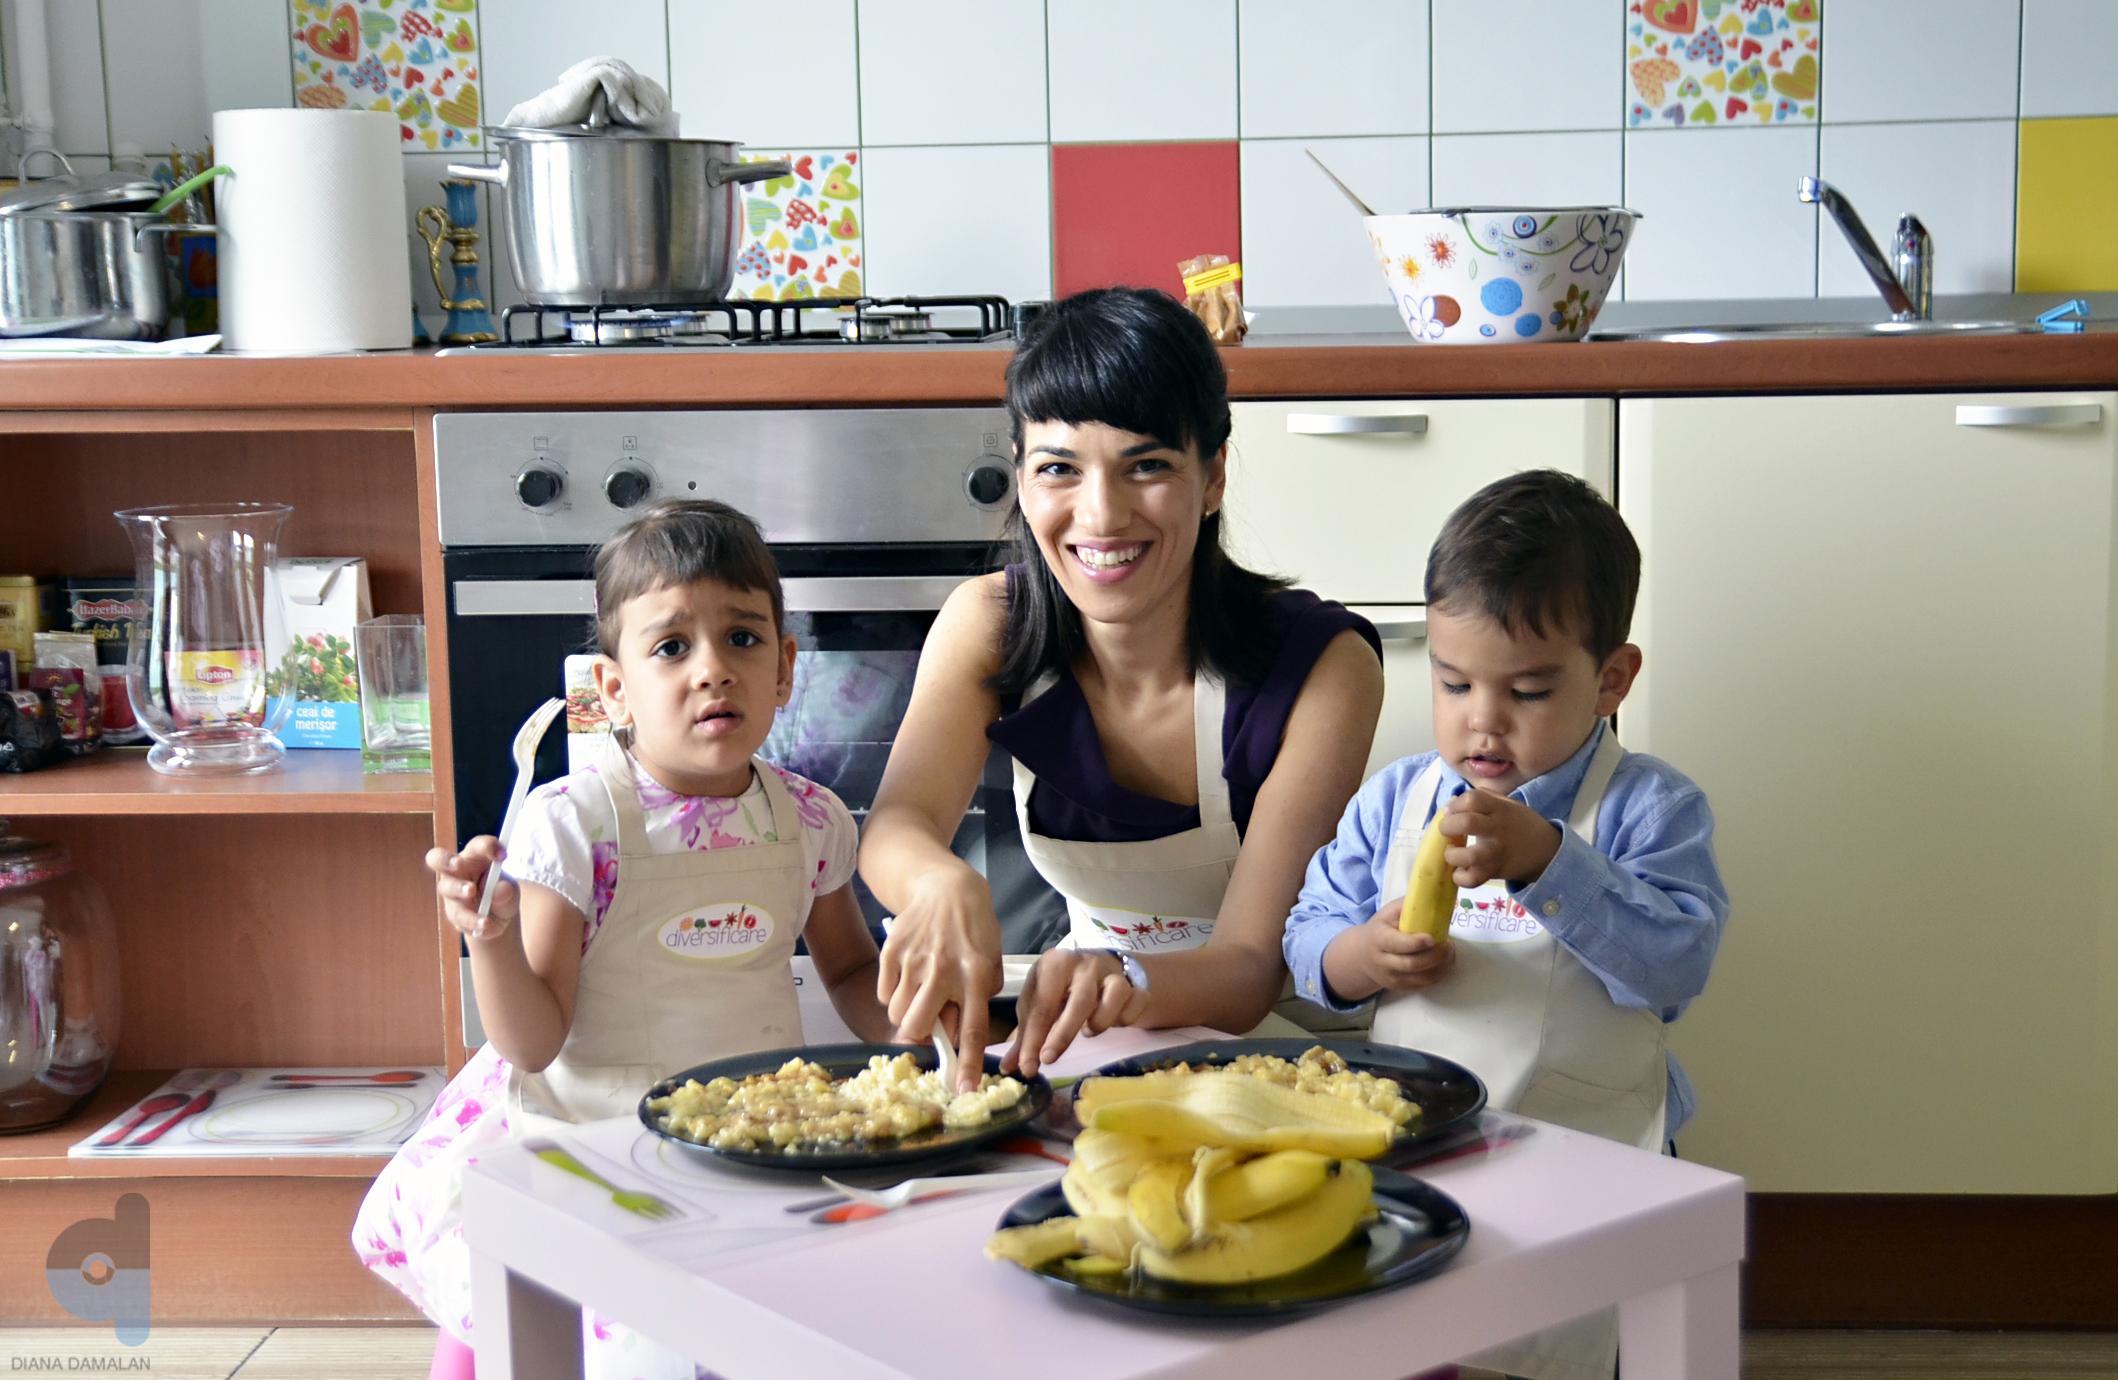 Eugenia Dobrescu | Totul despre mame